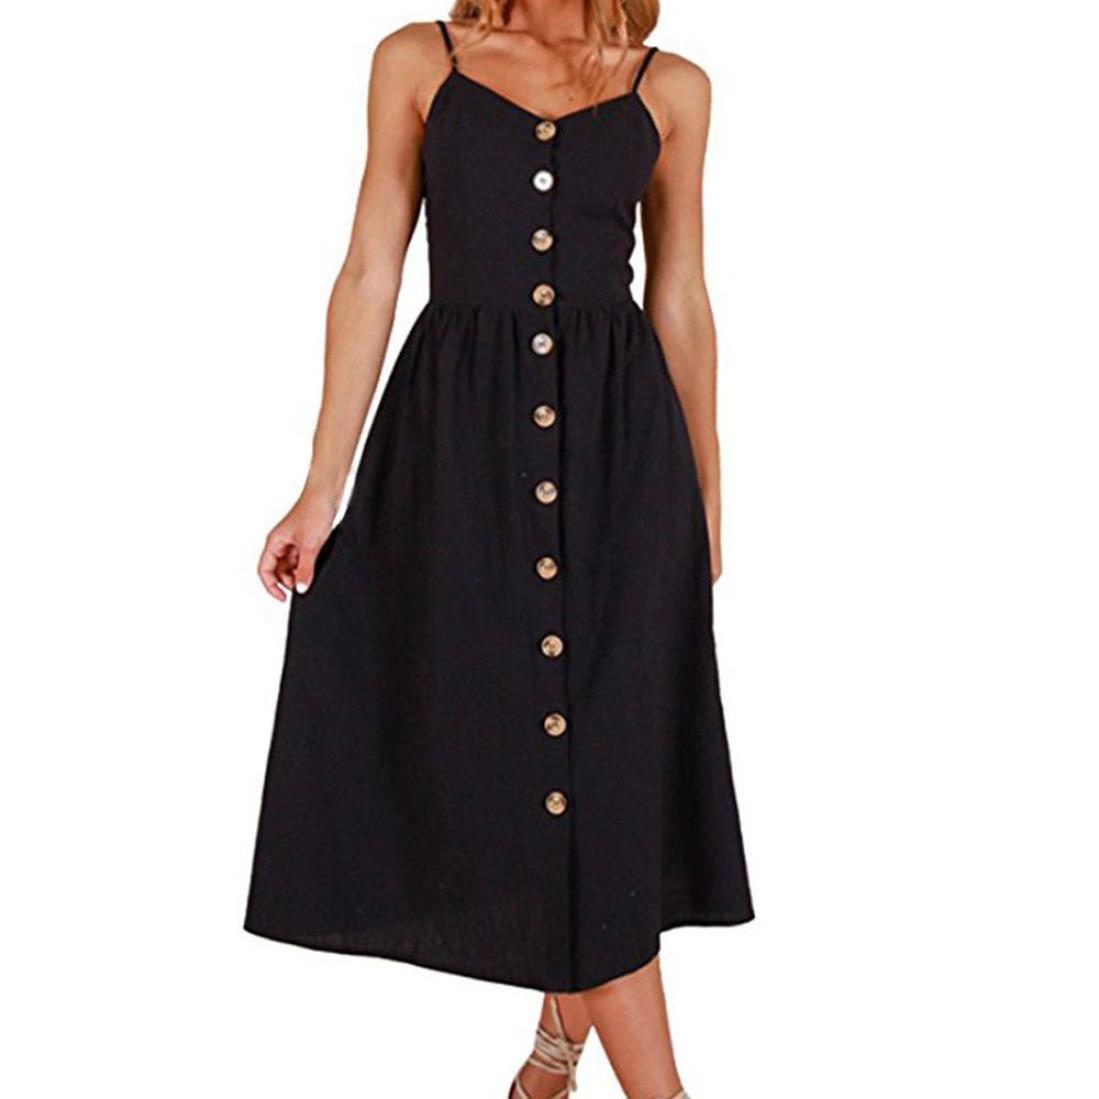 Women Long Dress Daoroka Ladies Sexy V Neck Strap Off Shoulder Vintage Flower Print Boho Casual Loose Beach Skirt (M, Black2)